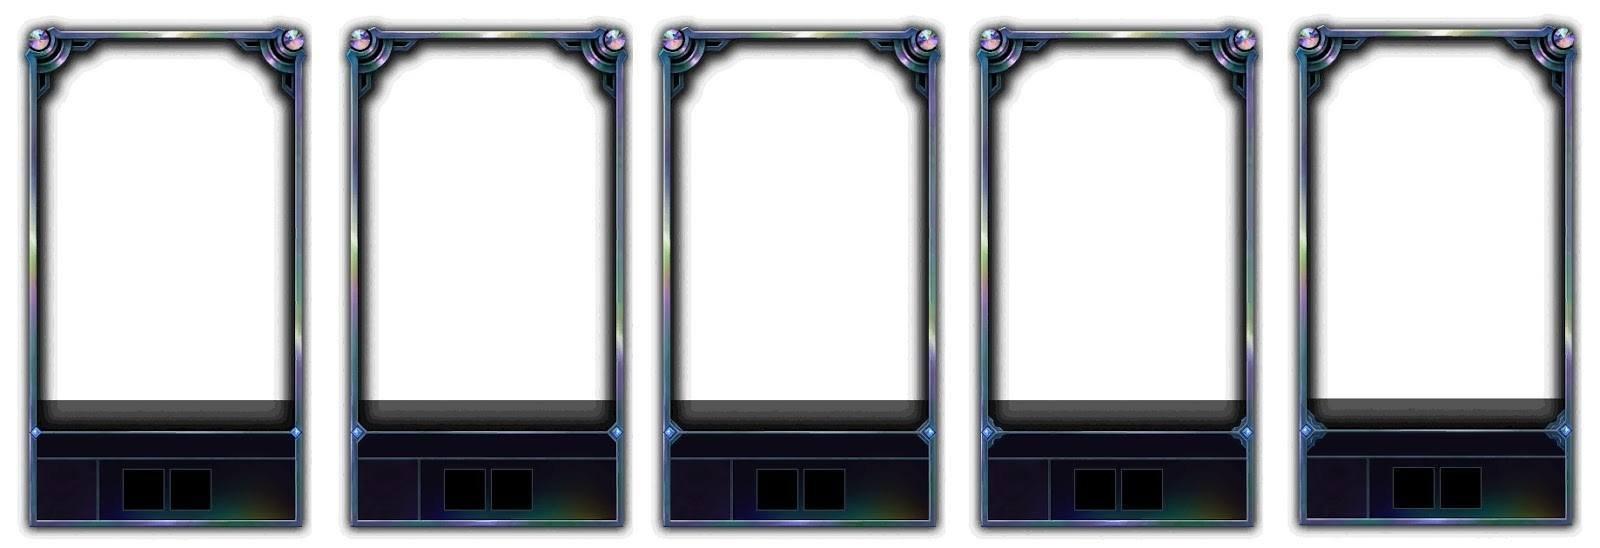 Diamond Loading Screen Border